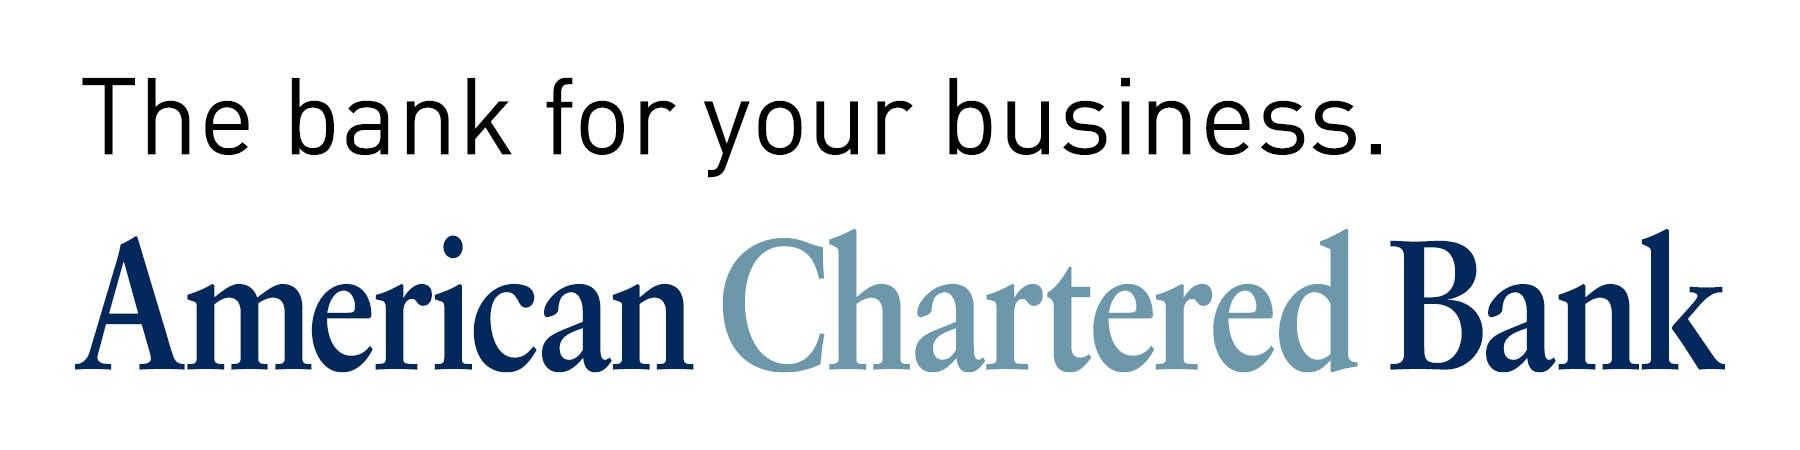 American  Chartered Bank logo 5.3.13.JPG